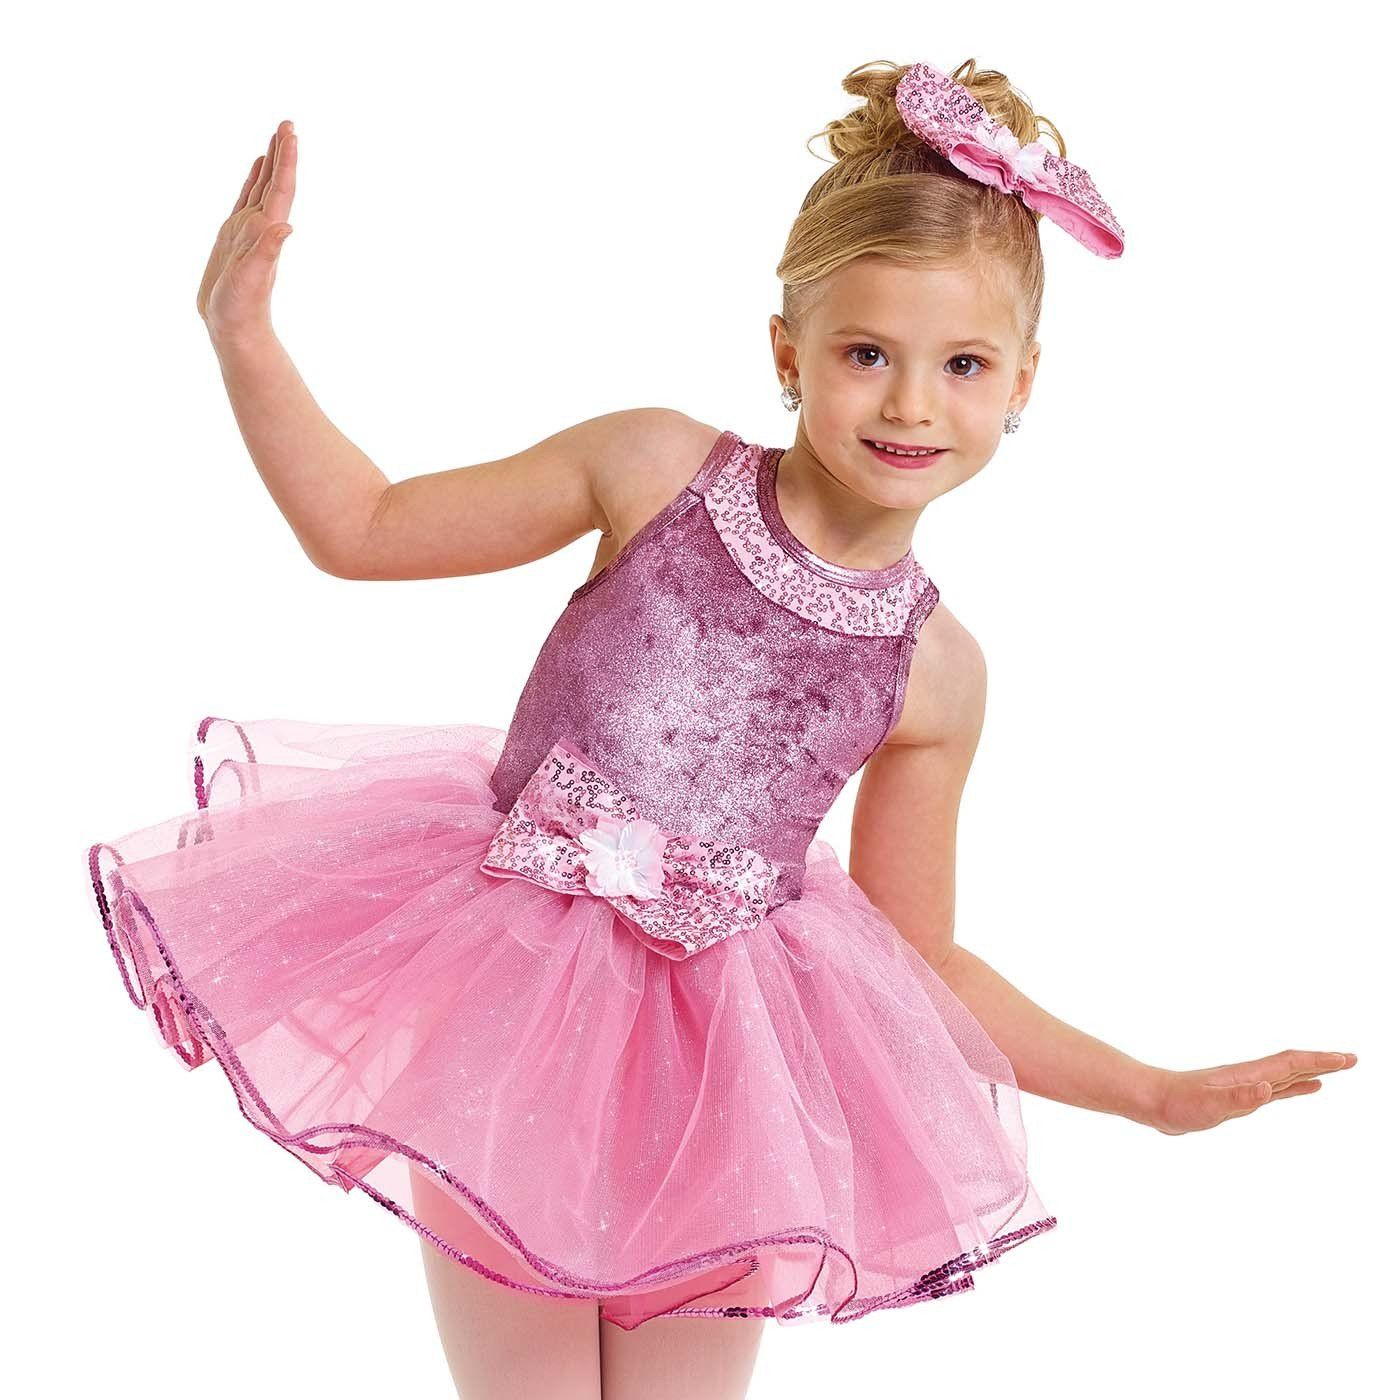 Moonlit Mauve Dance Recital Costumes Flower Girl Dresses